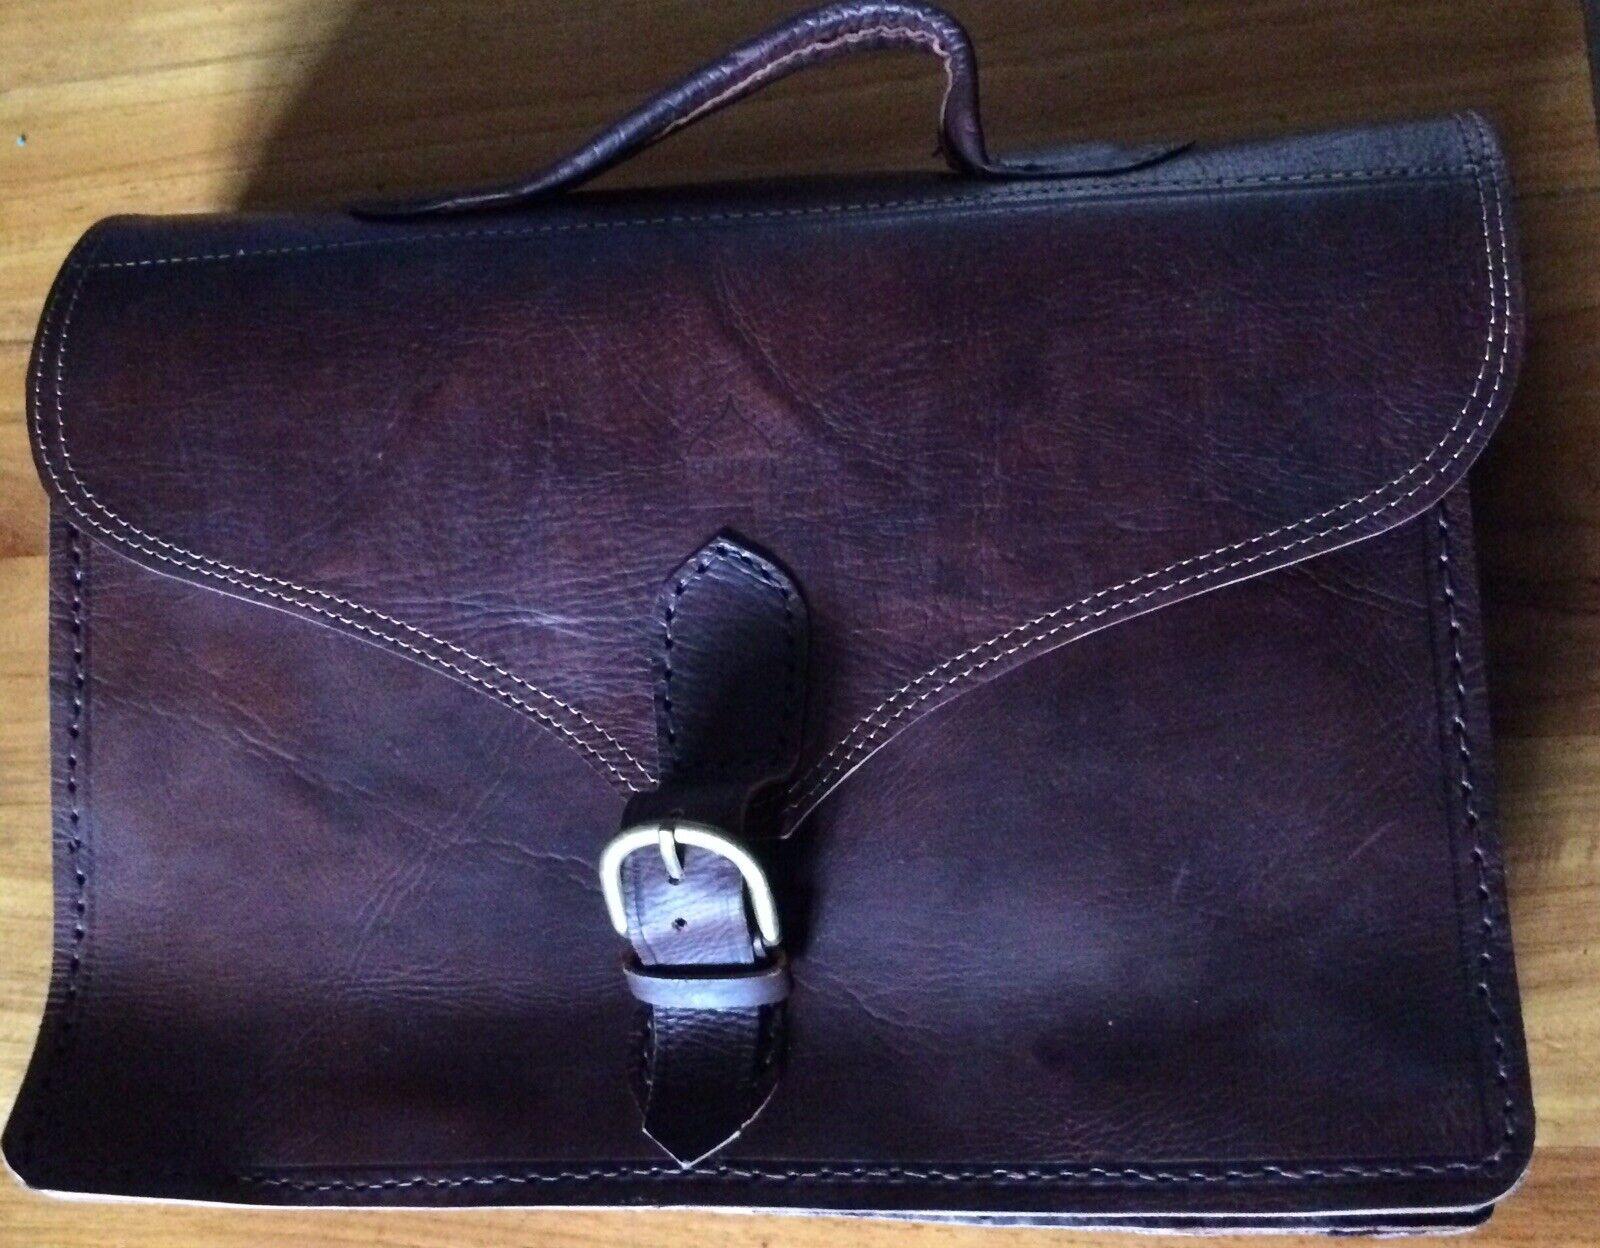 Berber Satchel Dark Brown LEATHER briefcase bag large full grain